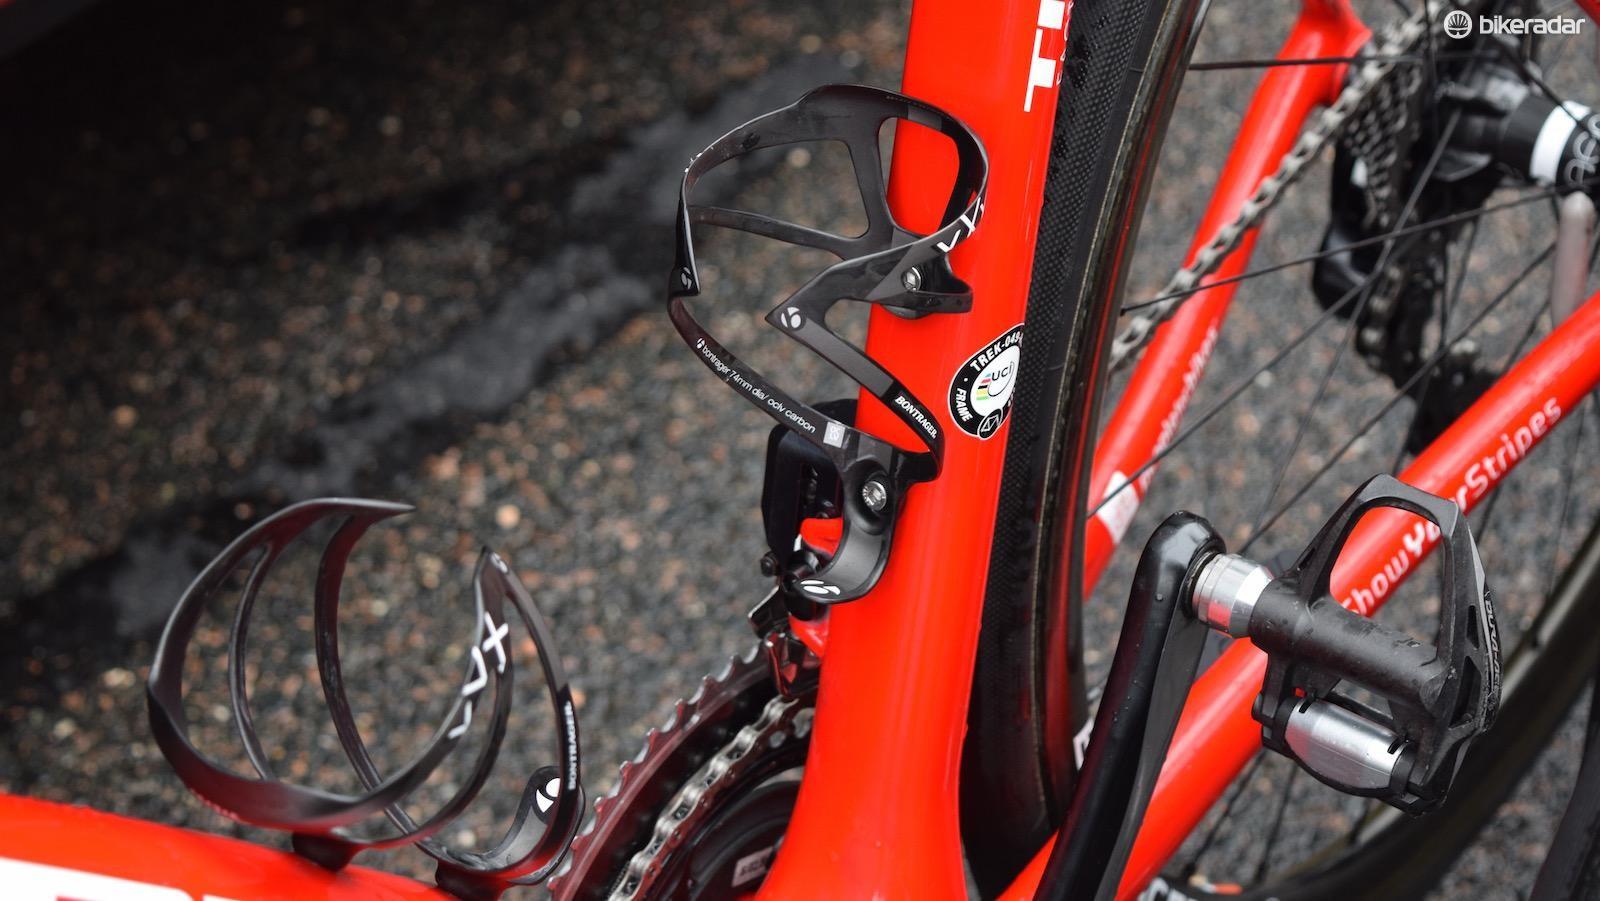 Bontrager XXX bottle cages alongside the UCI approved frame sticker